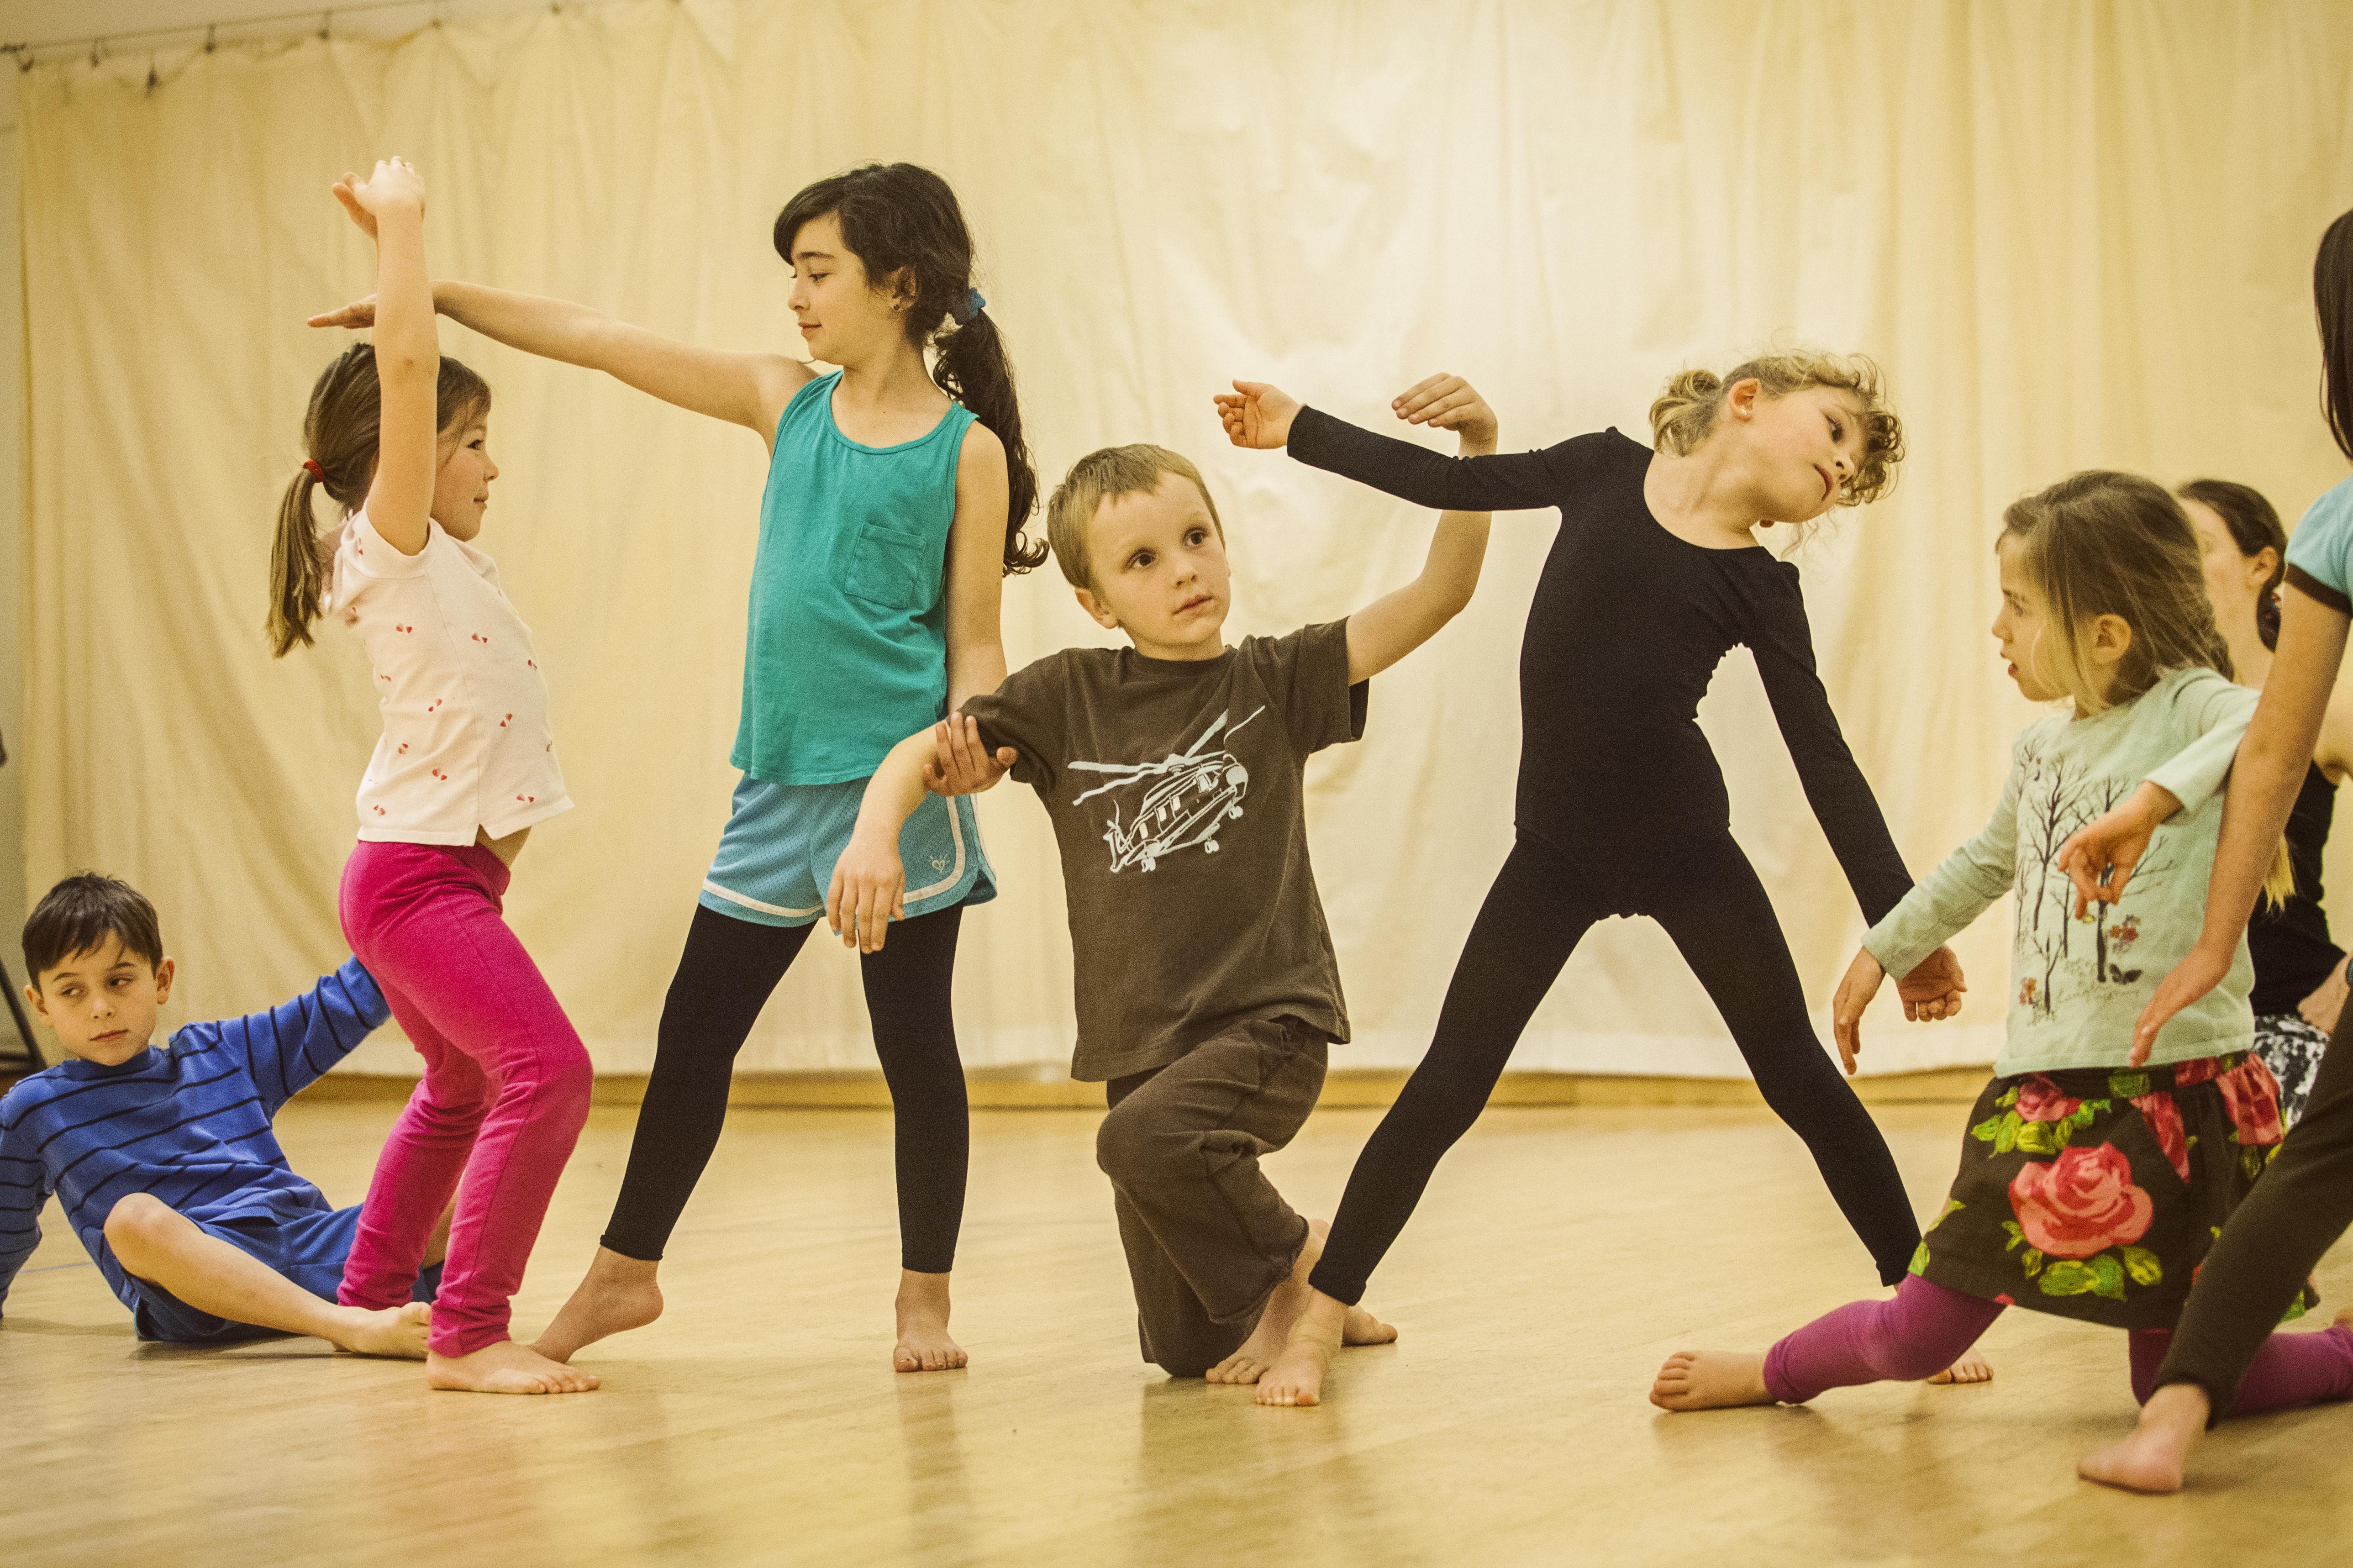 Tiny Dancers The Best Dance Studios For Kids